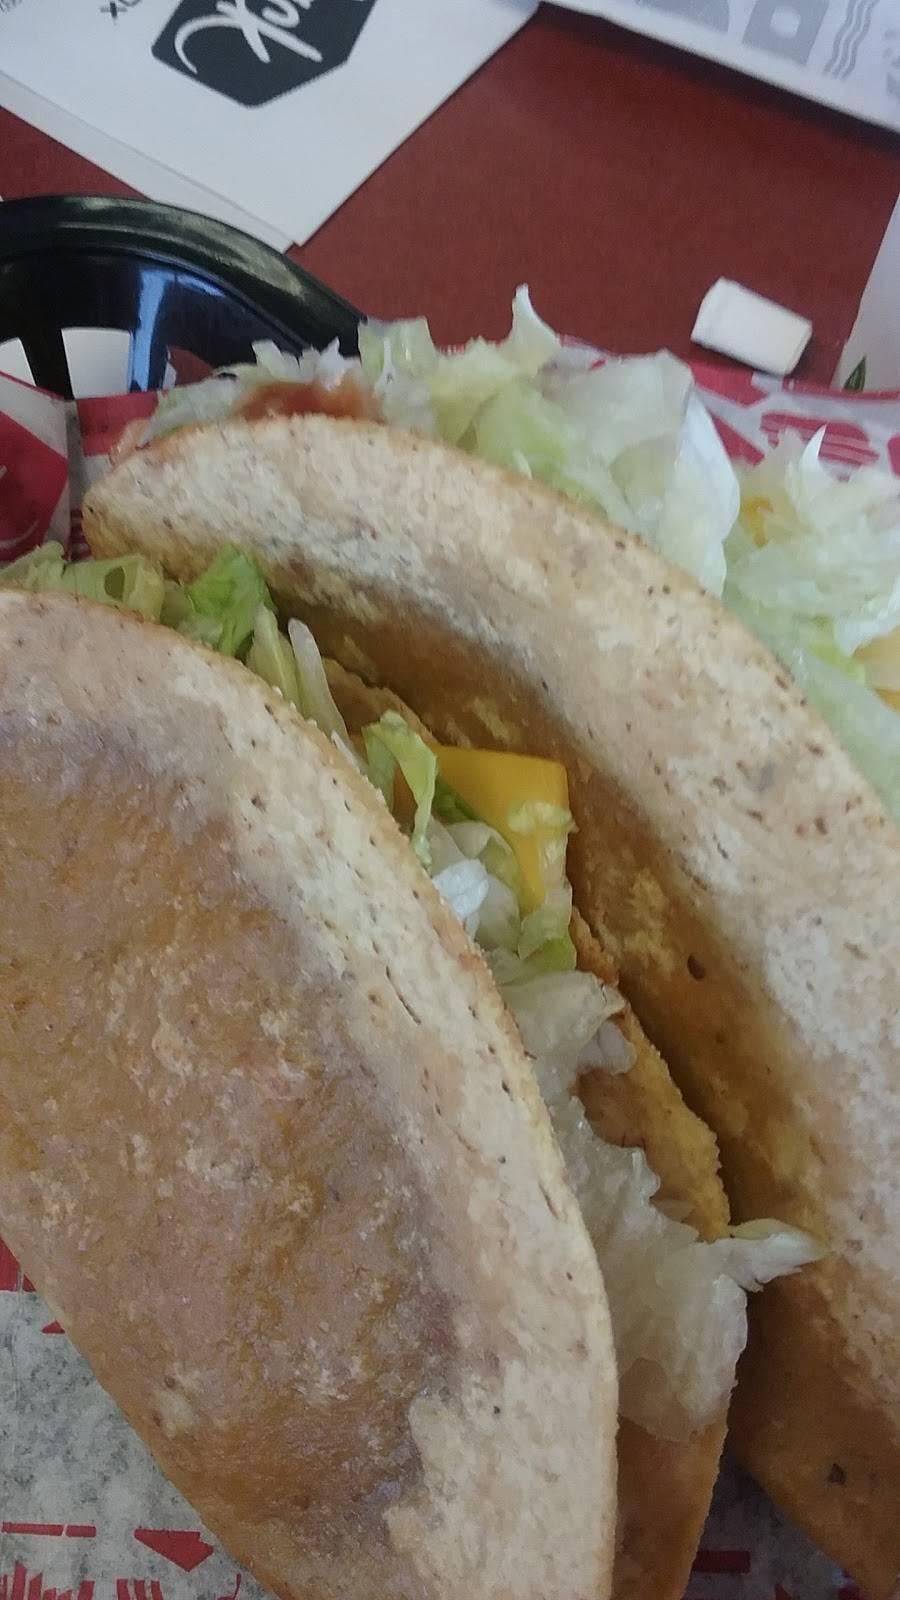 Jack in the Box   restaurant   9195 Jurupa Rd, Riverside, CA 92509, USA   9516816161 OR +1 951-681-6161